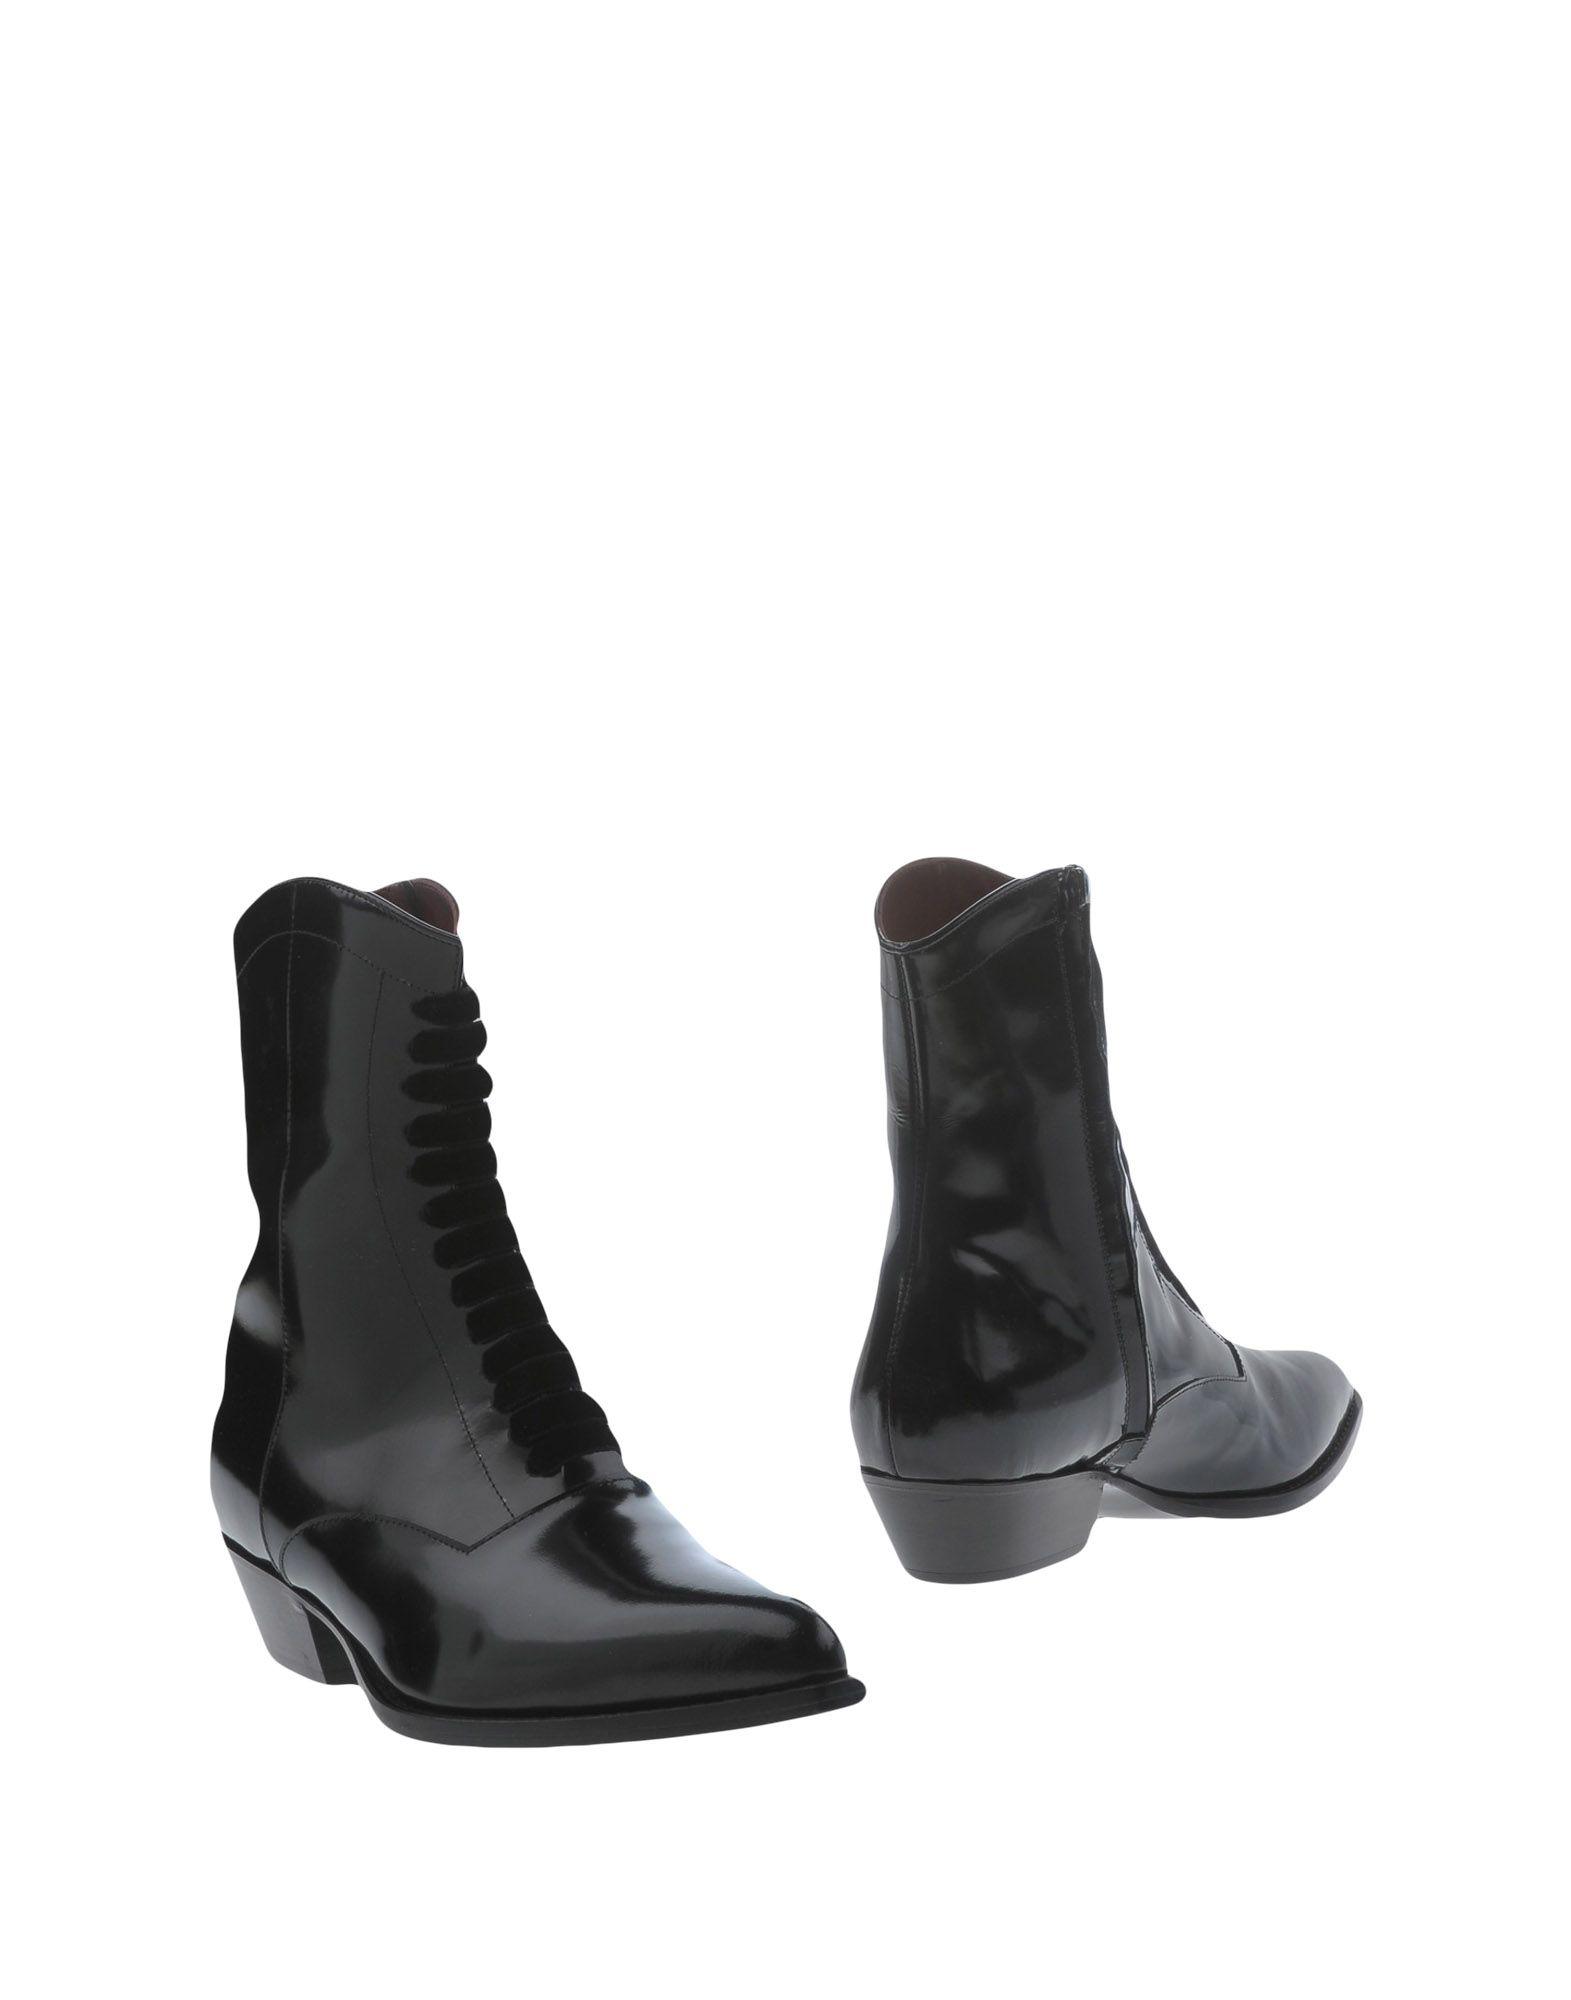 Rabatt Schuhe Philosophy Damen Di Lorenzo Serafini Stiefelette Damen Philosophy  11293855FI 0096a7